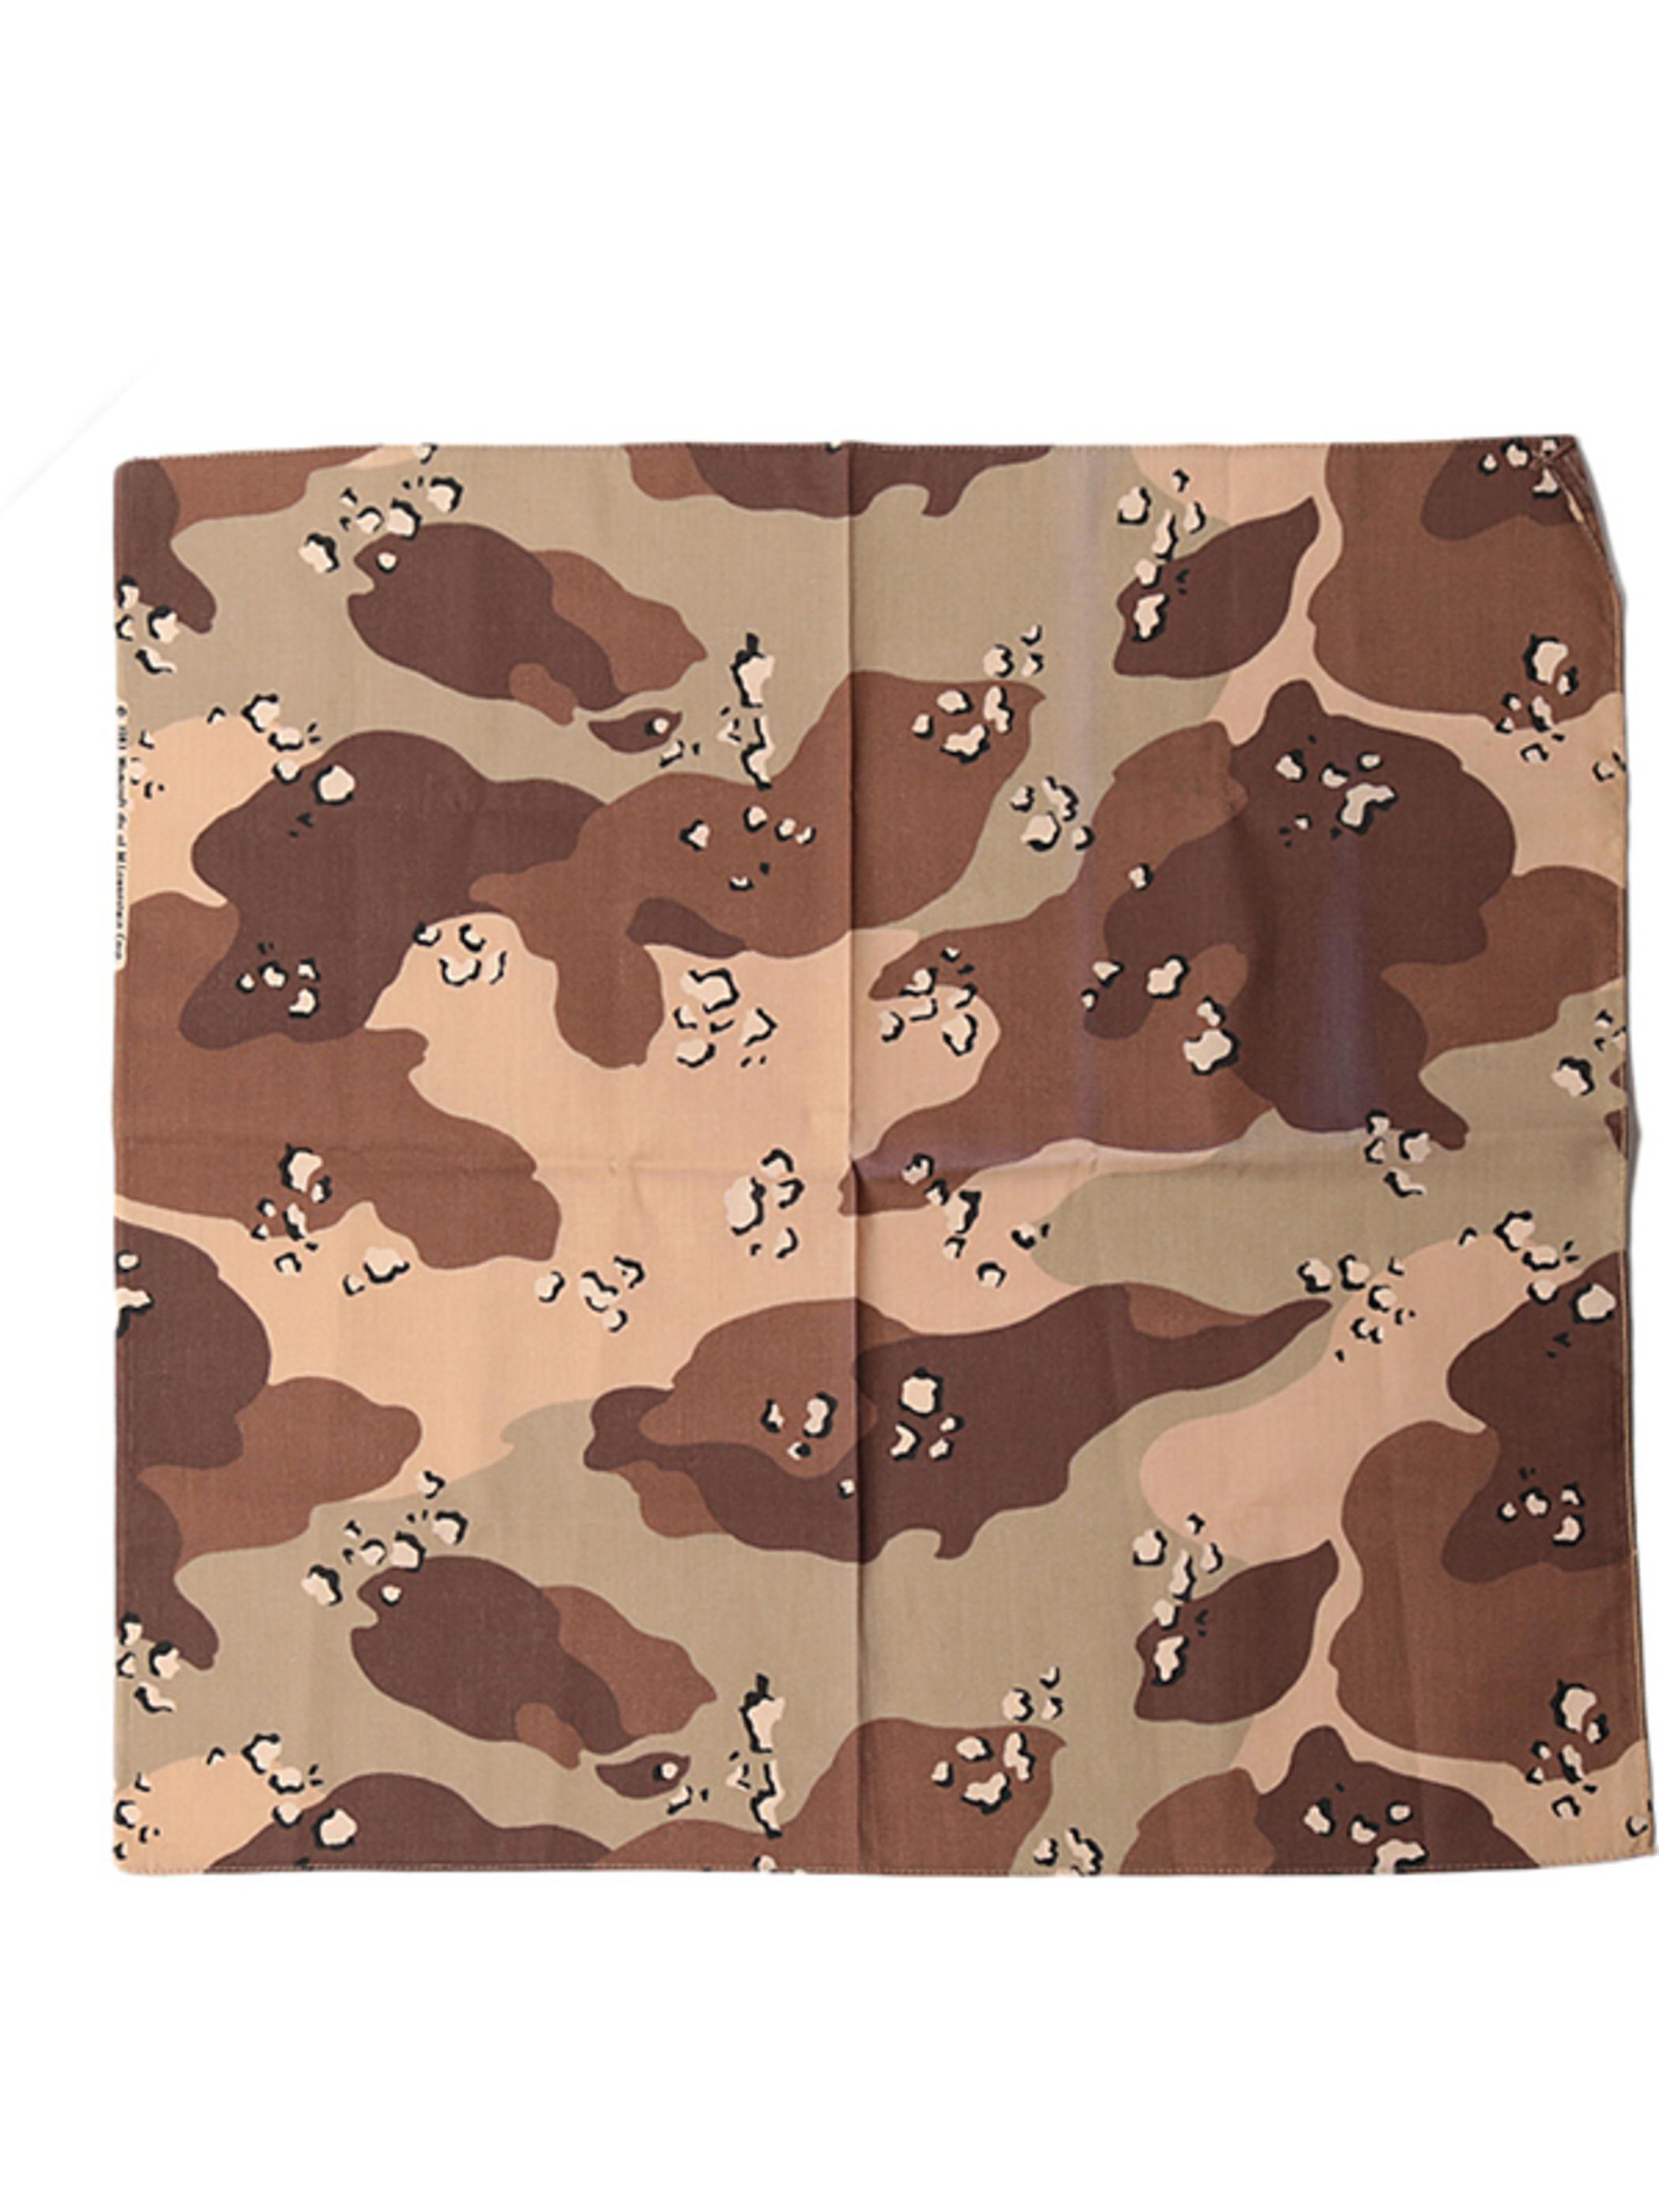 1980's Deadstock / Camouflage Bandana